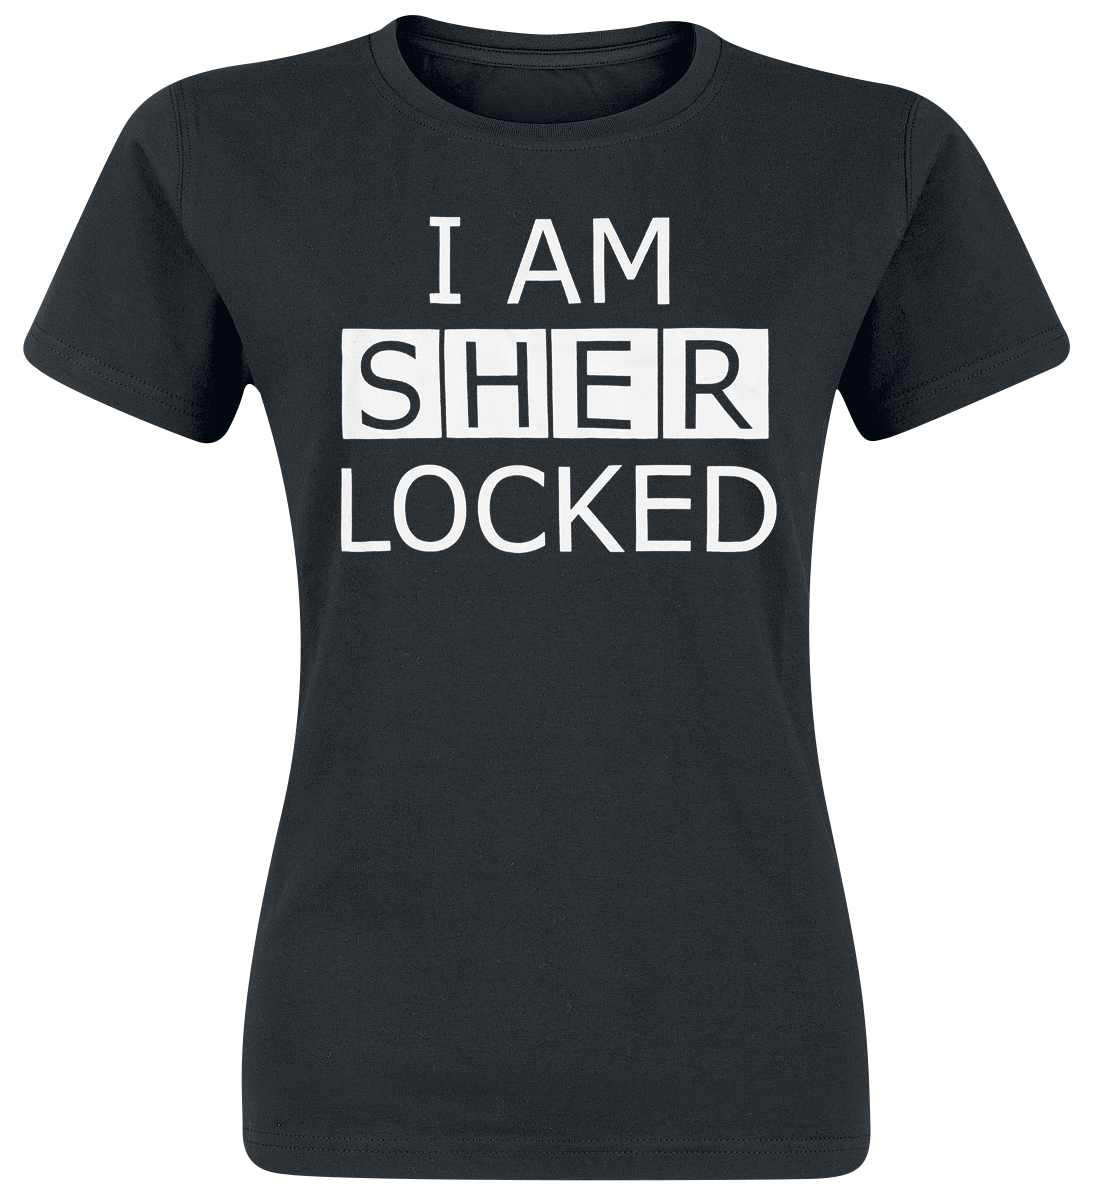 Sherlock - I Am Sherlocked - Girls shirt - black image